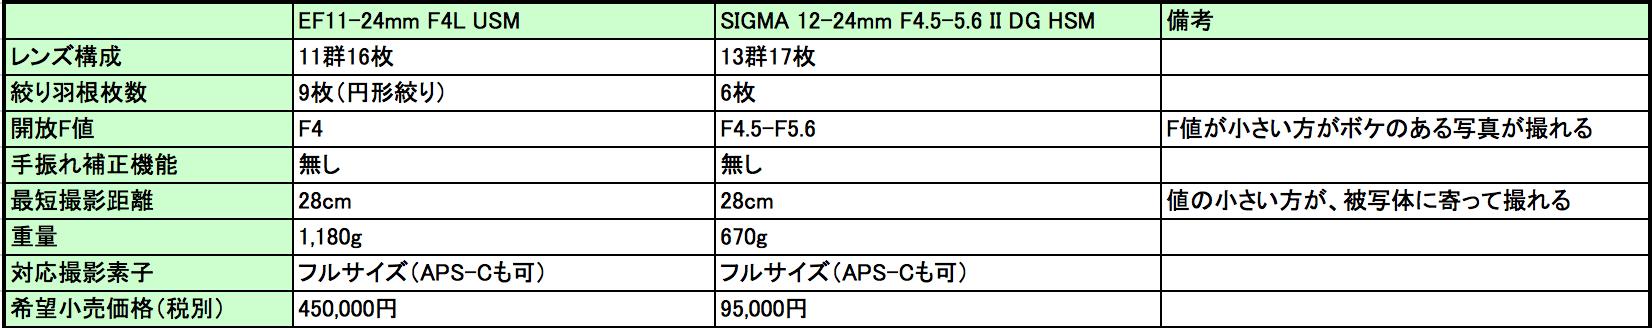 EF11-24mm vs SIGMA12-24mm